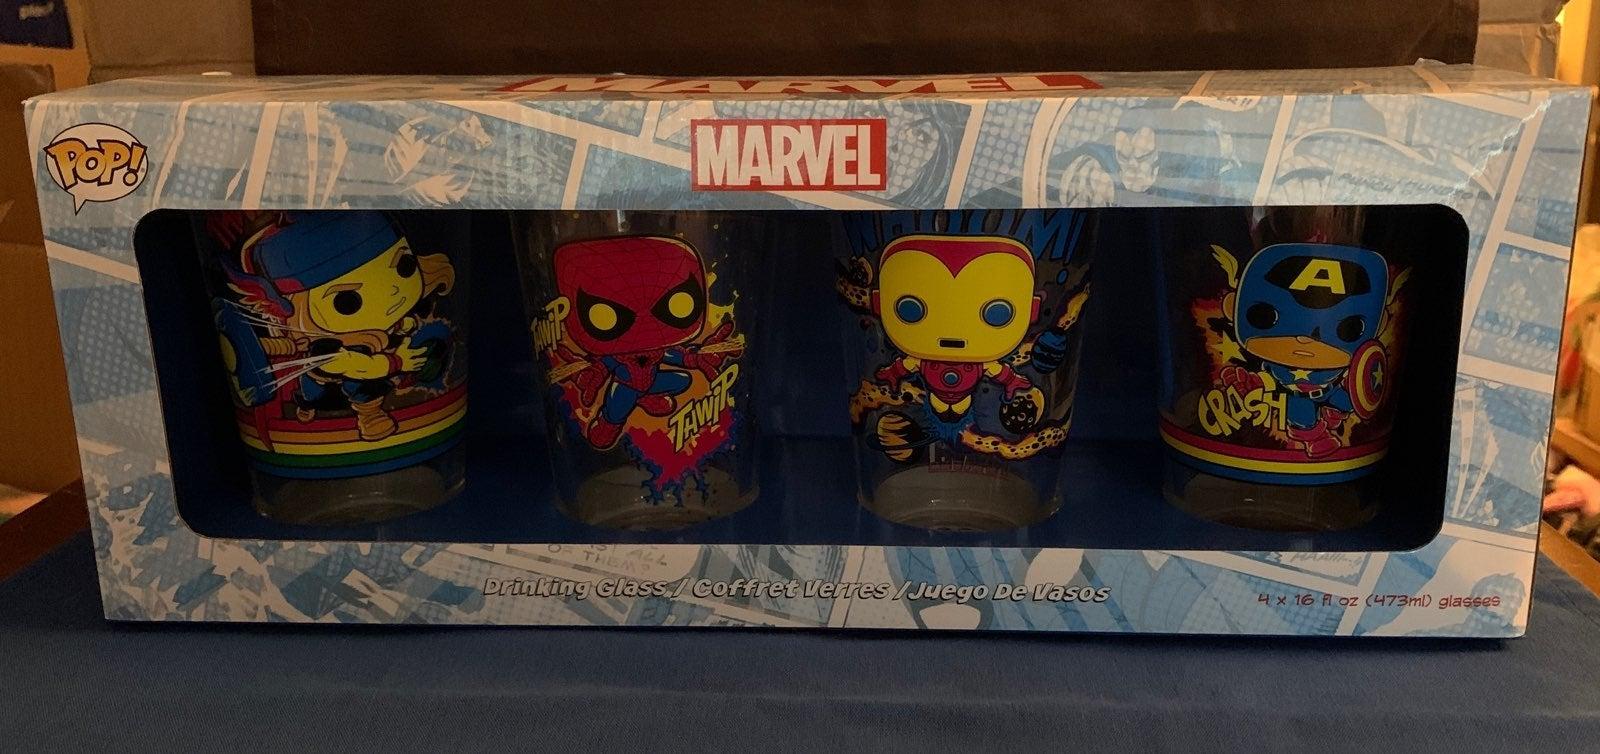 Target Exclusive Marvel 4 pack glass set